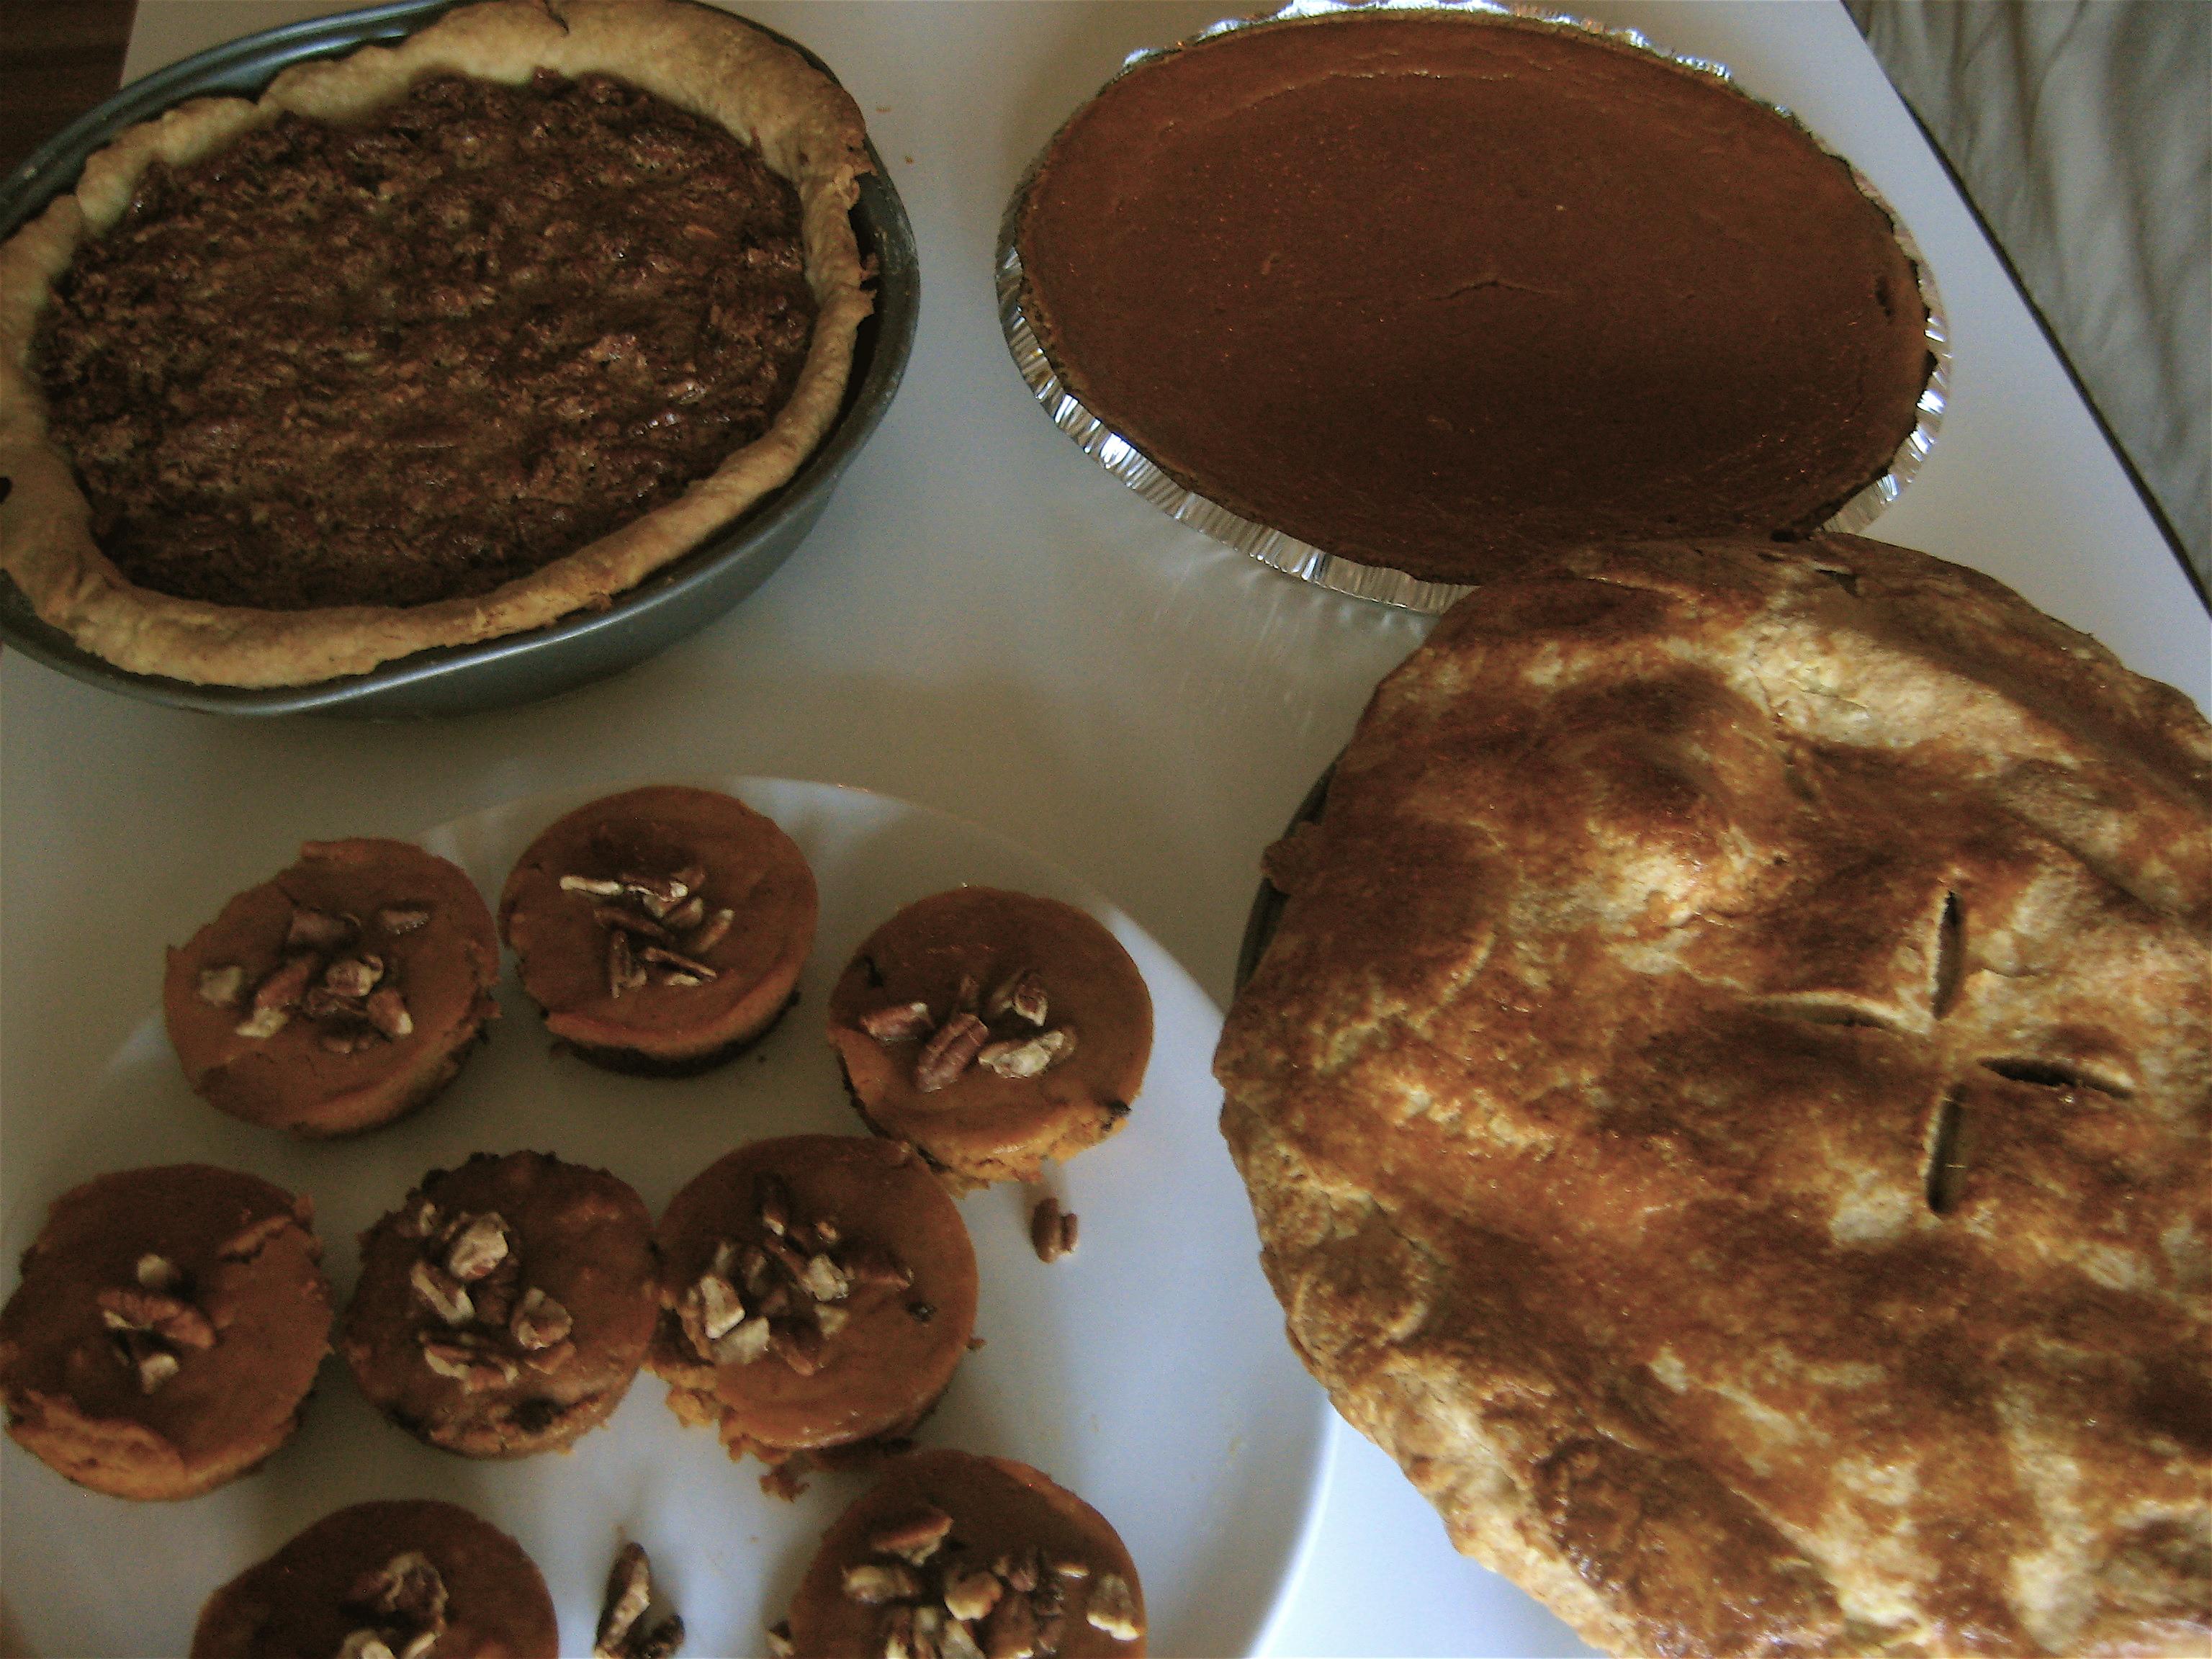 ... Pie, Smooth Pumpkin Pie, Apple Pie and Mini Chocolate Chip Pumpkin Pie